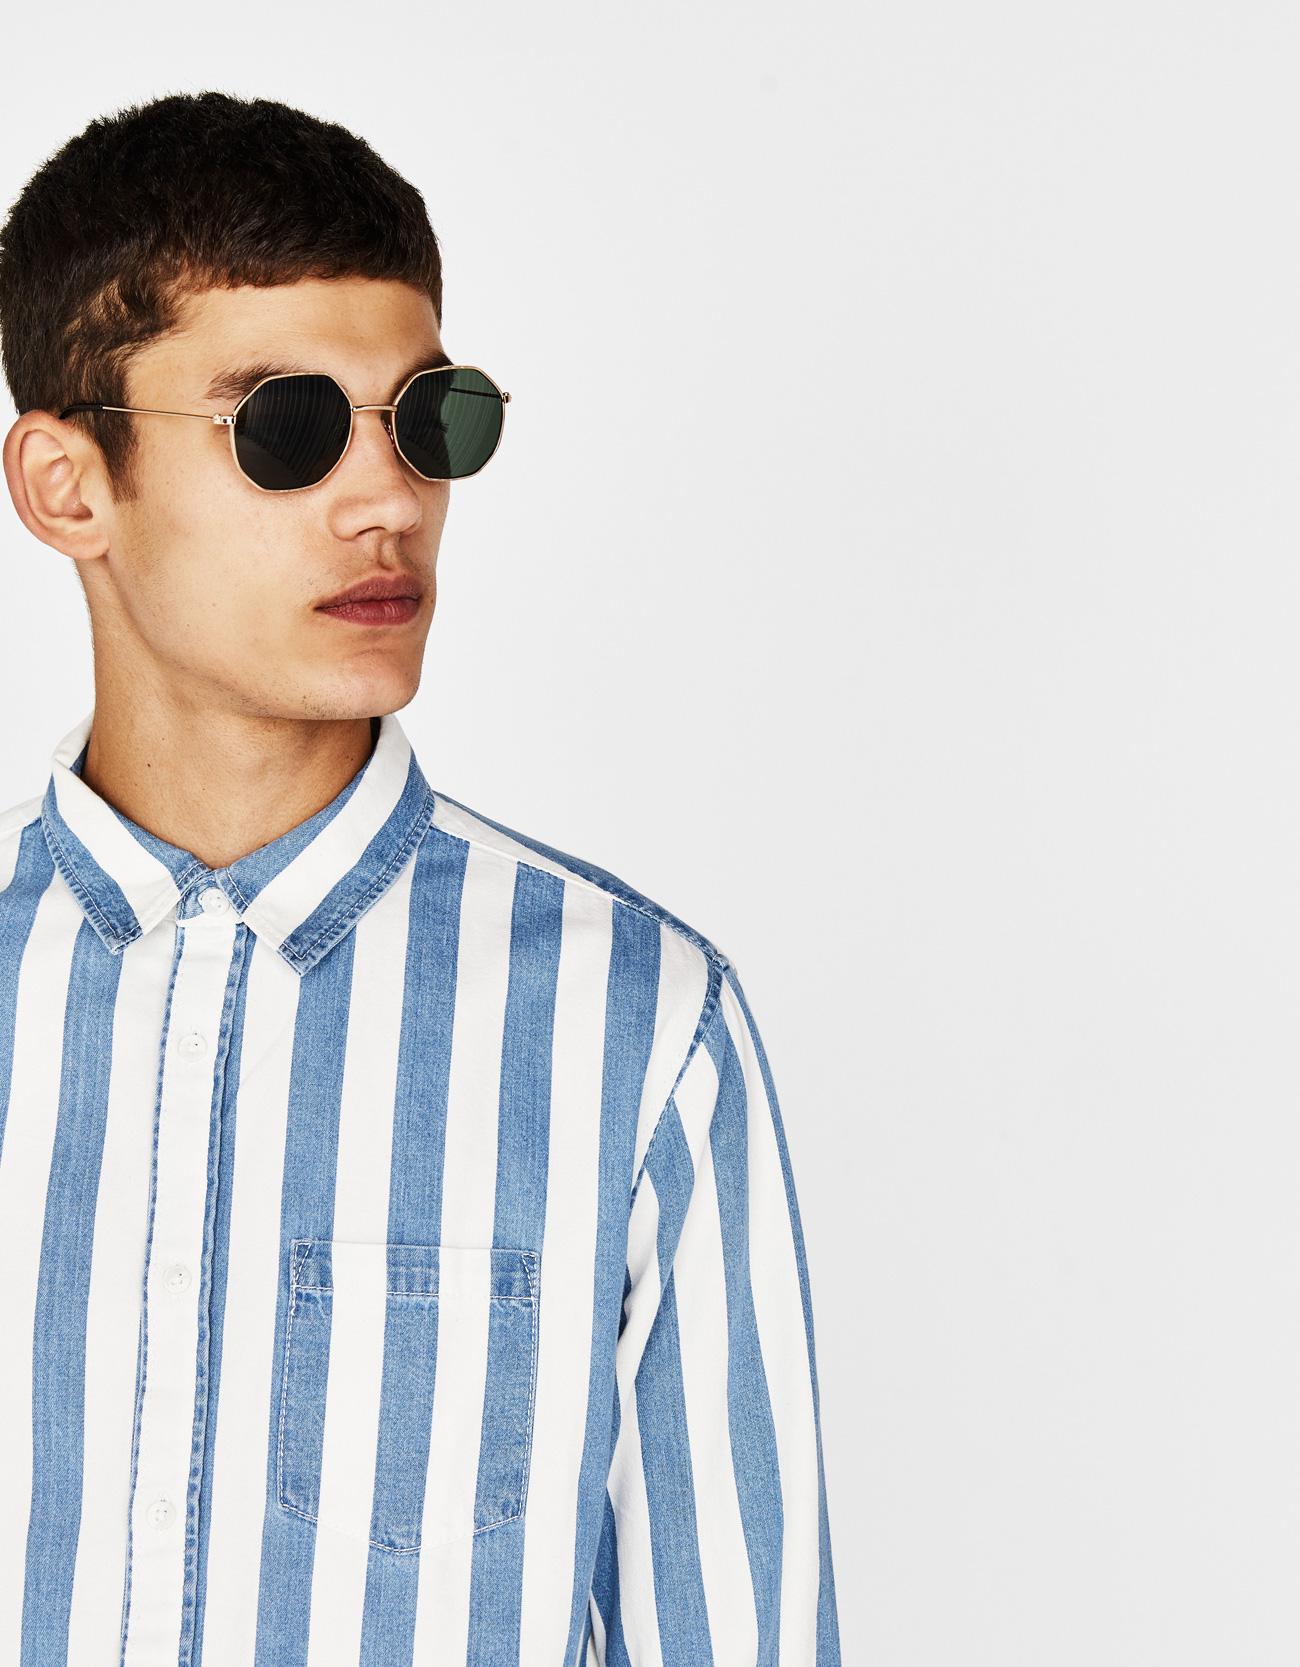 897dd49f5c Hexagonal sunglasses